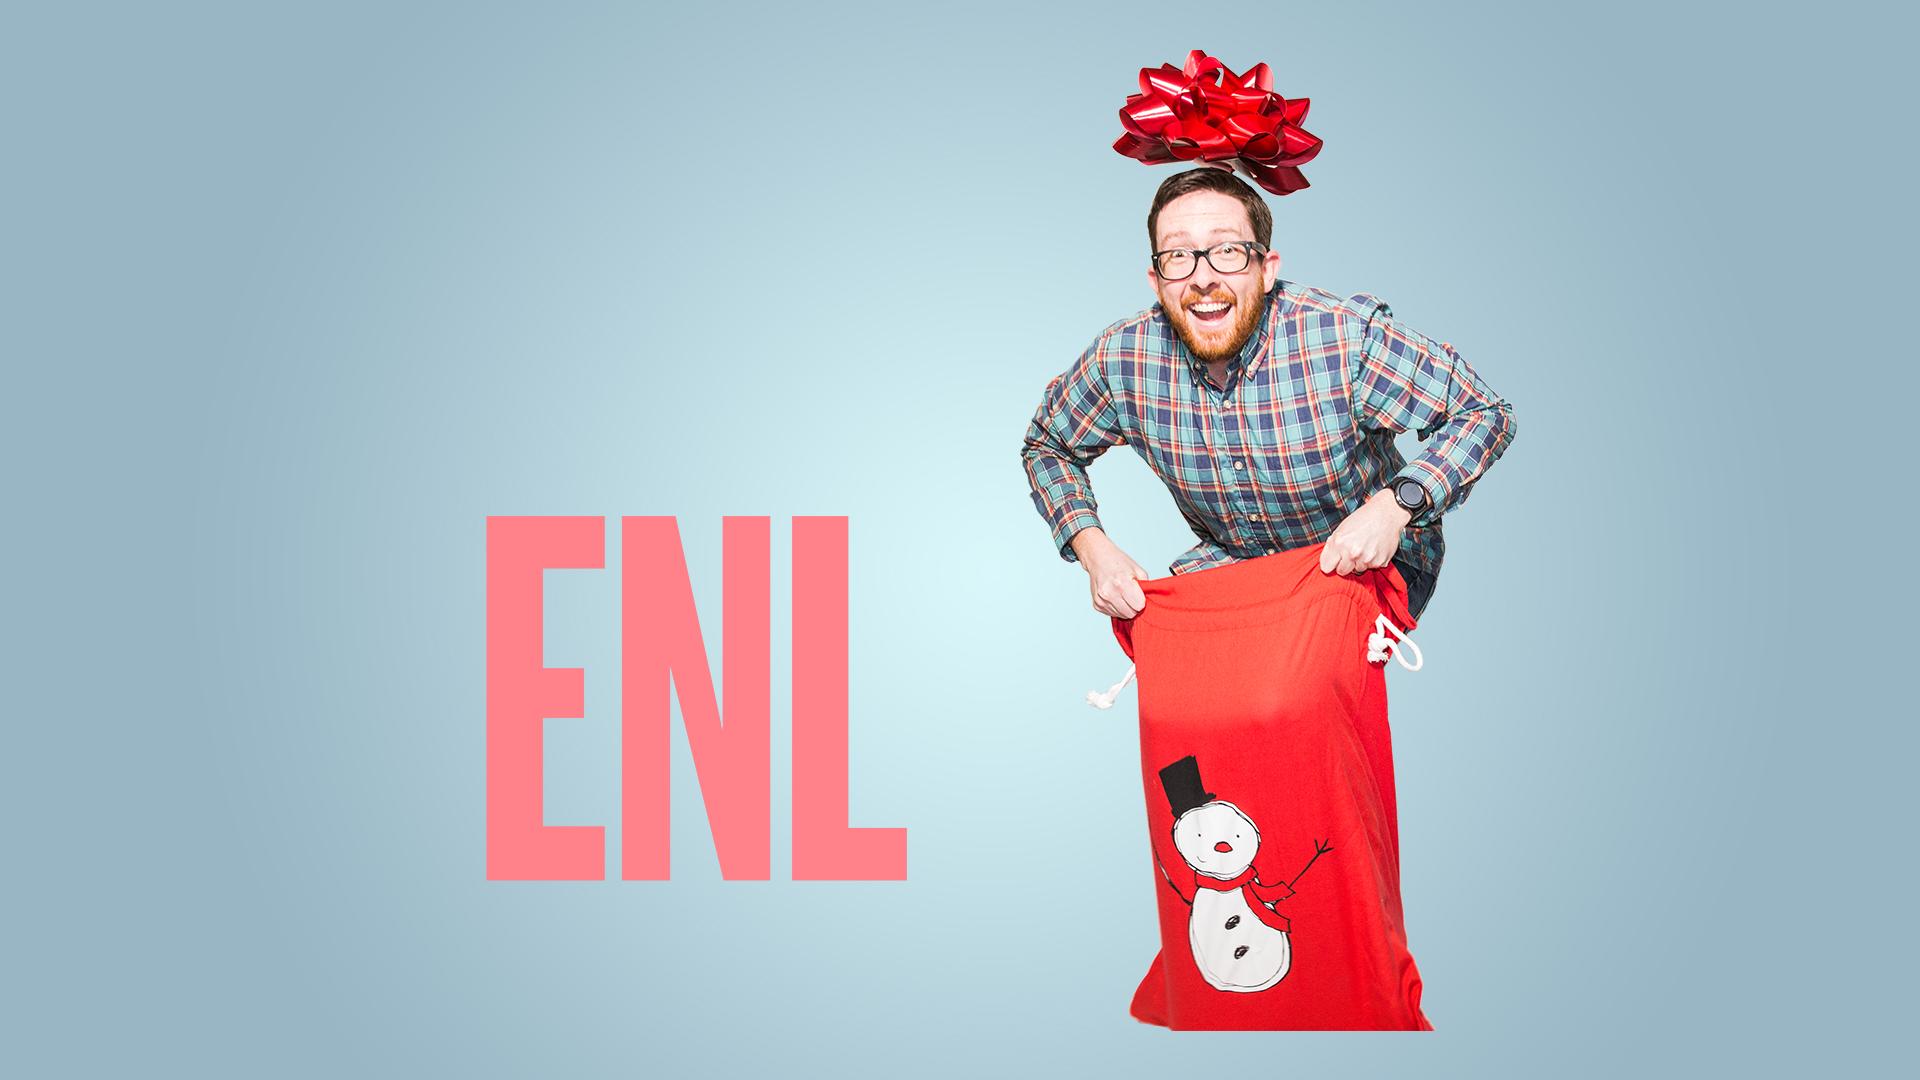 ENL_26.jpg